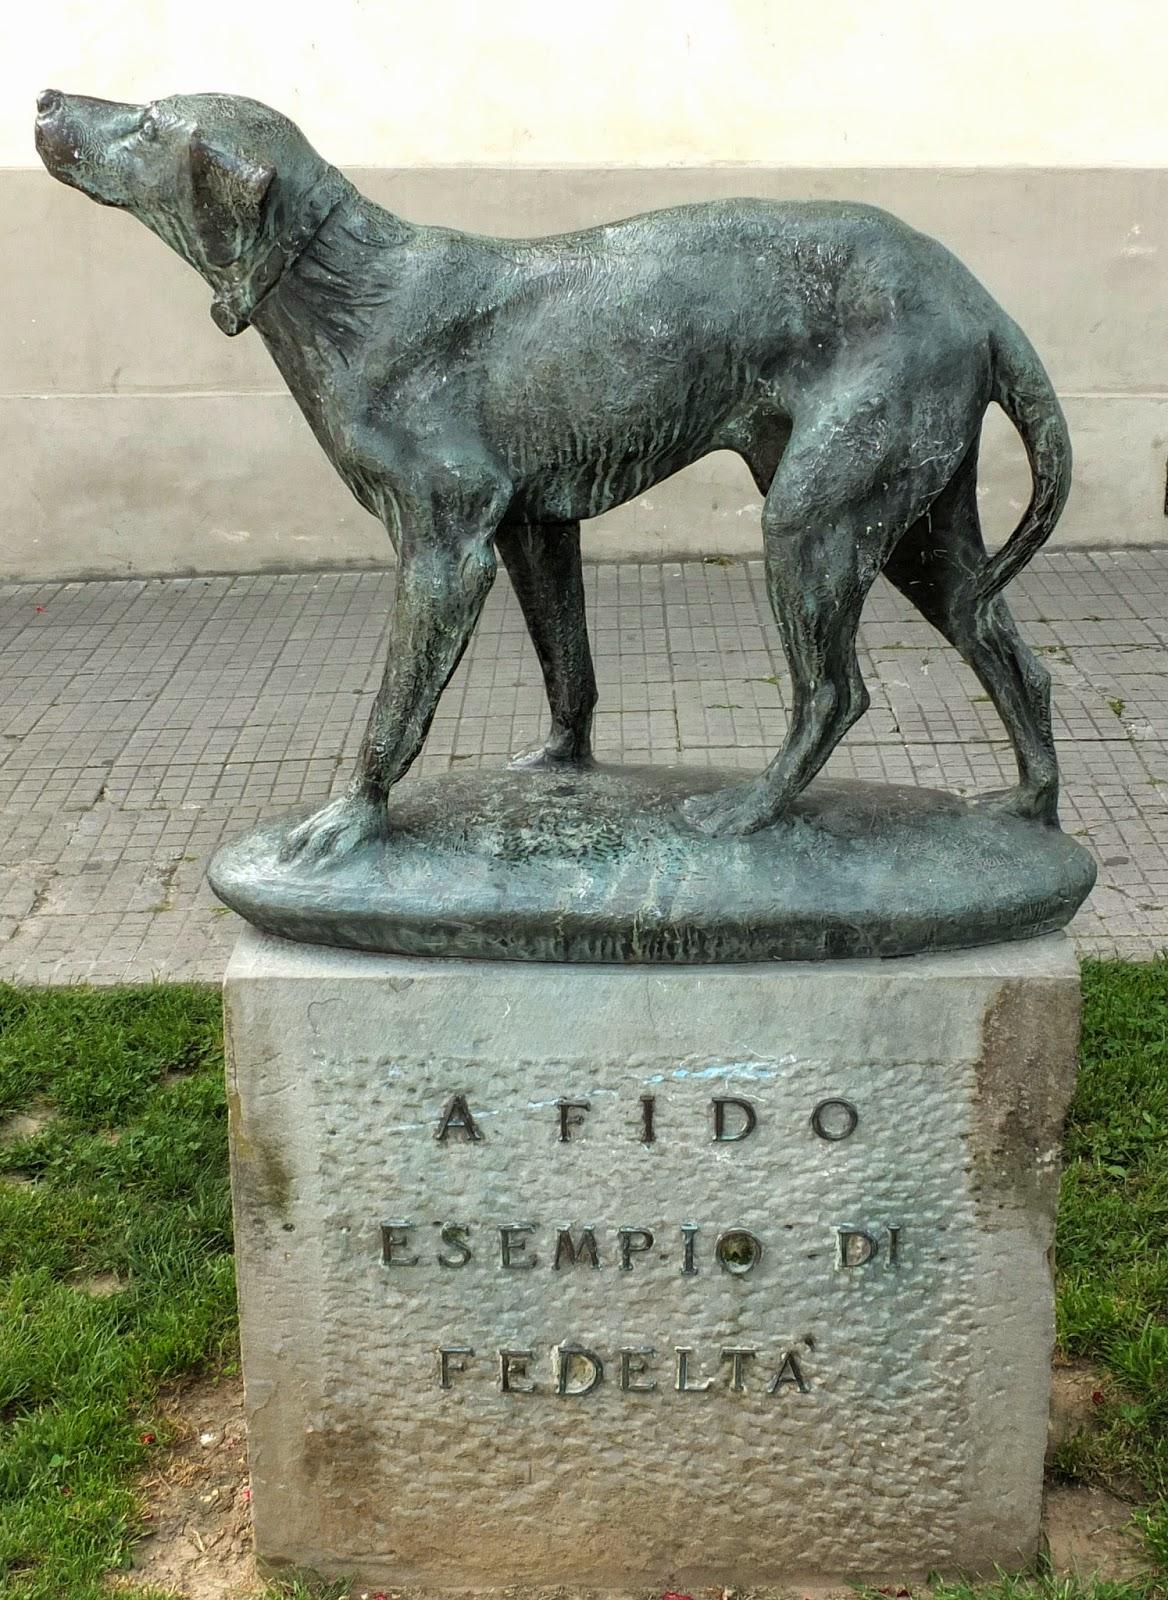 Fido Statue.  Borgo San Lorenzo, Tuscany